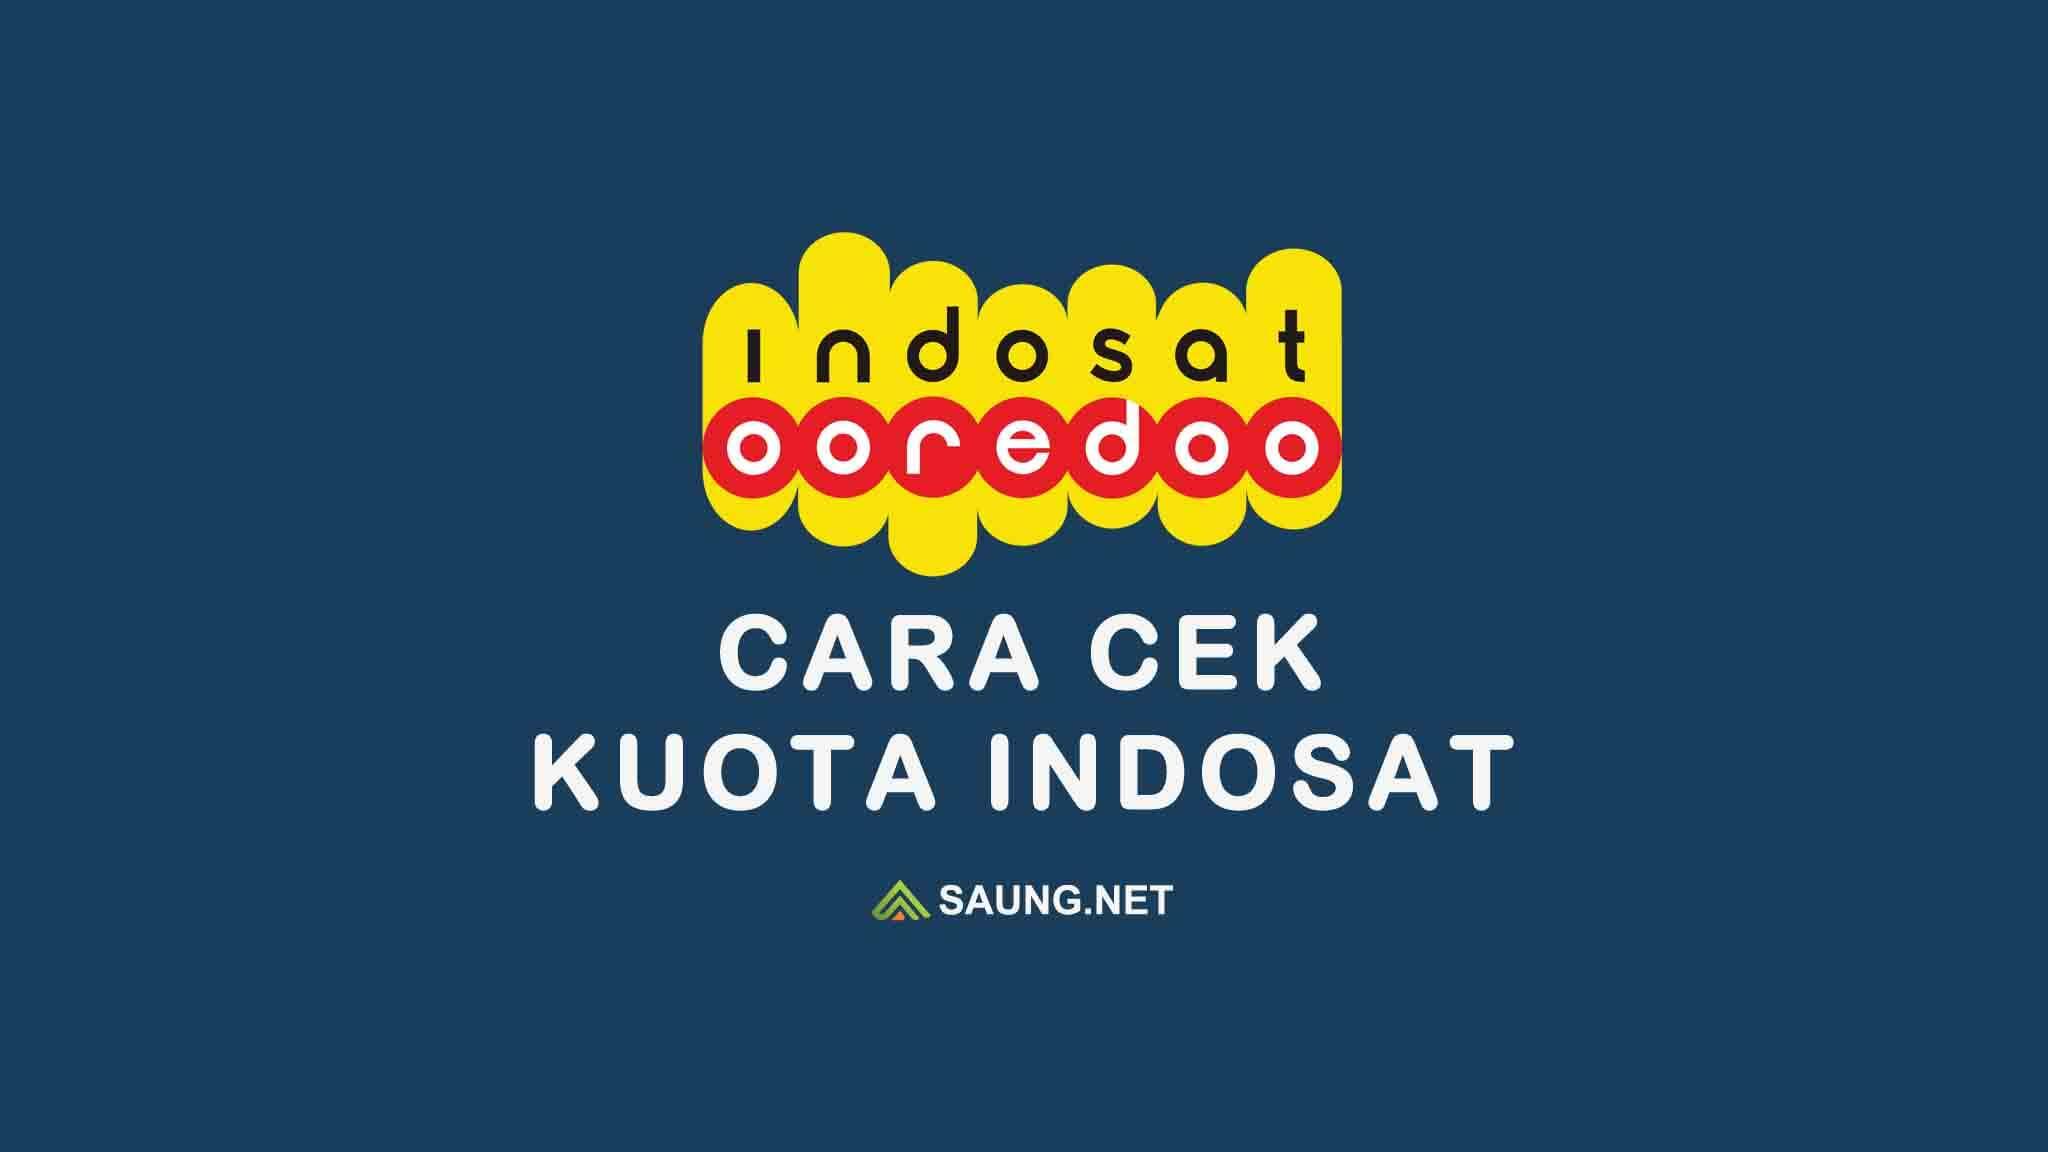 5 Cara Cek Kuota Indosat 2019 Ooredoo Im3 Masa Aktif